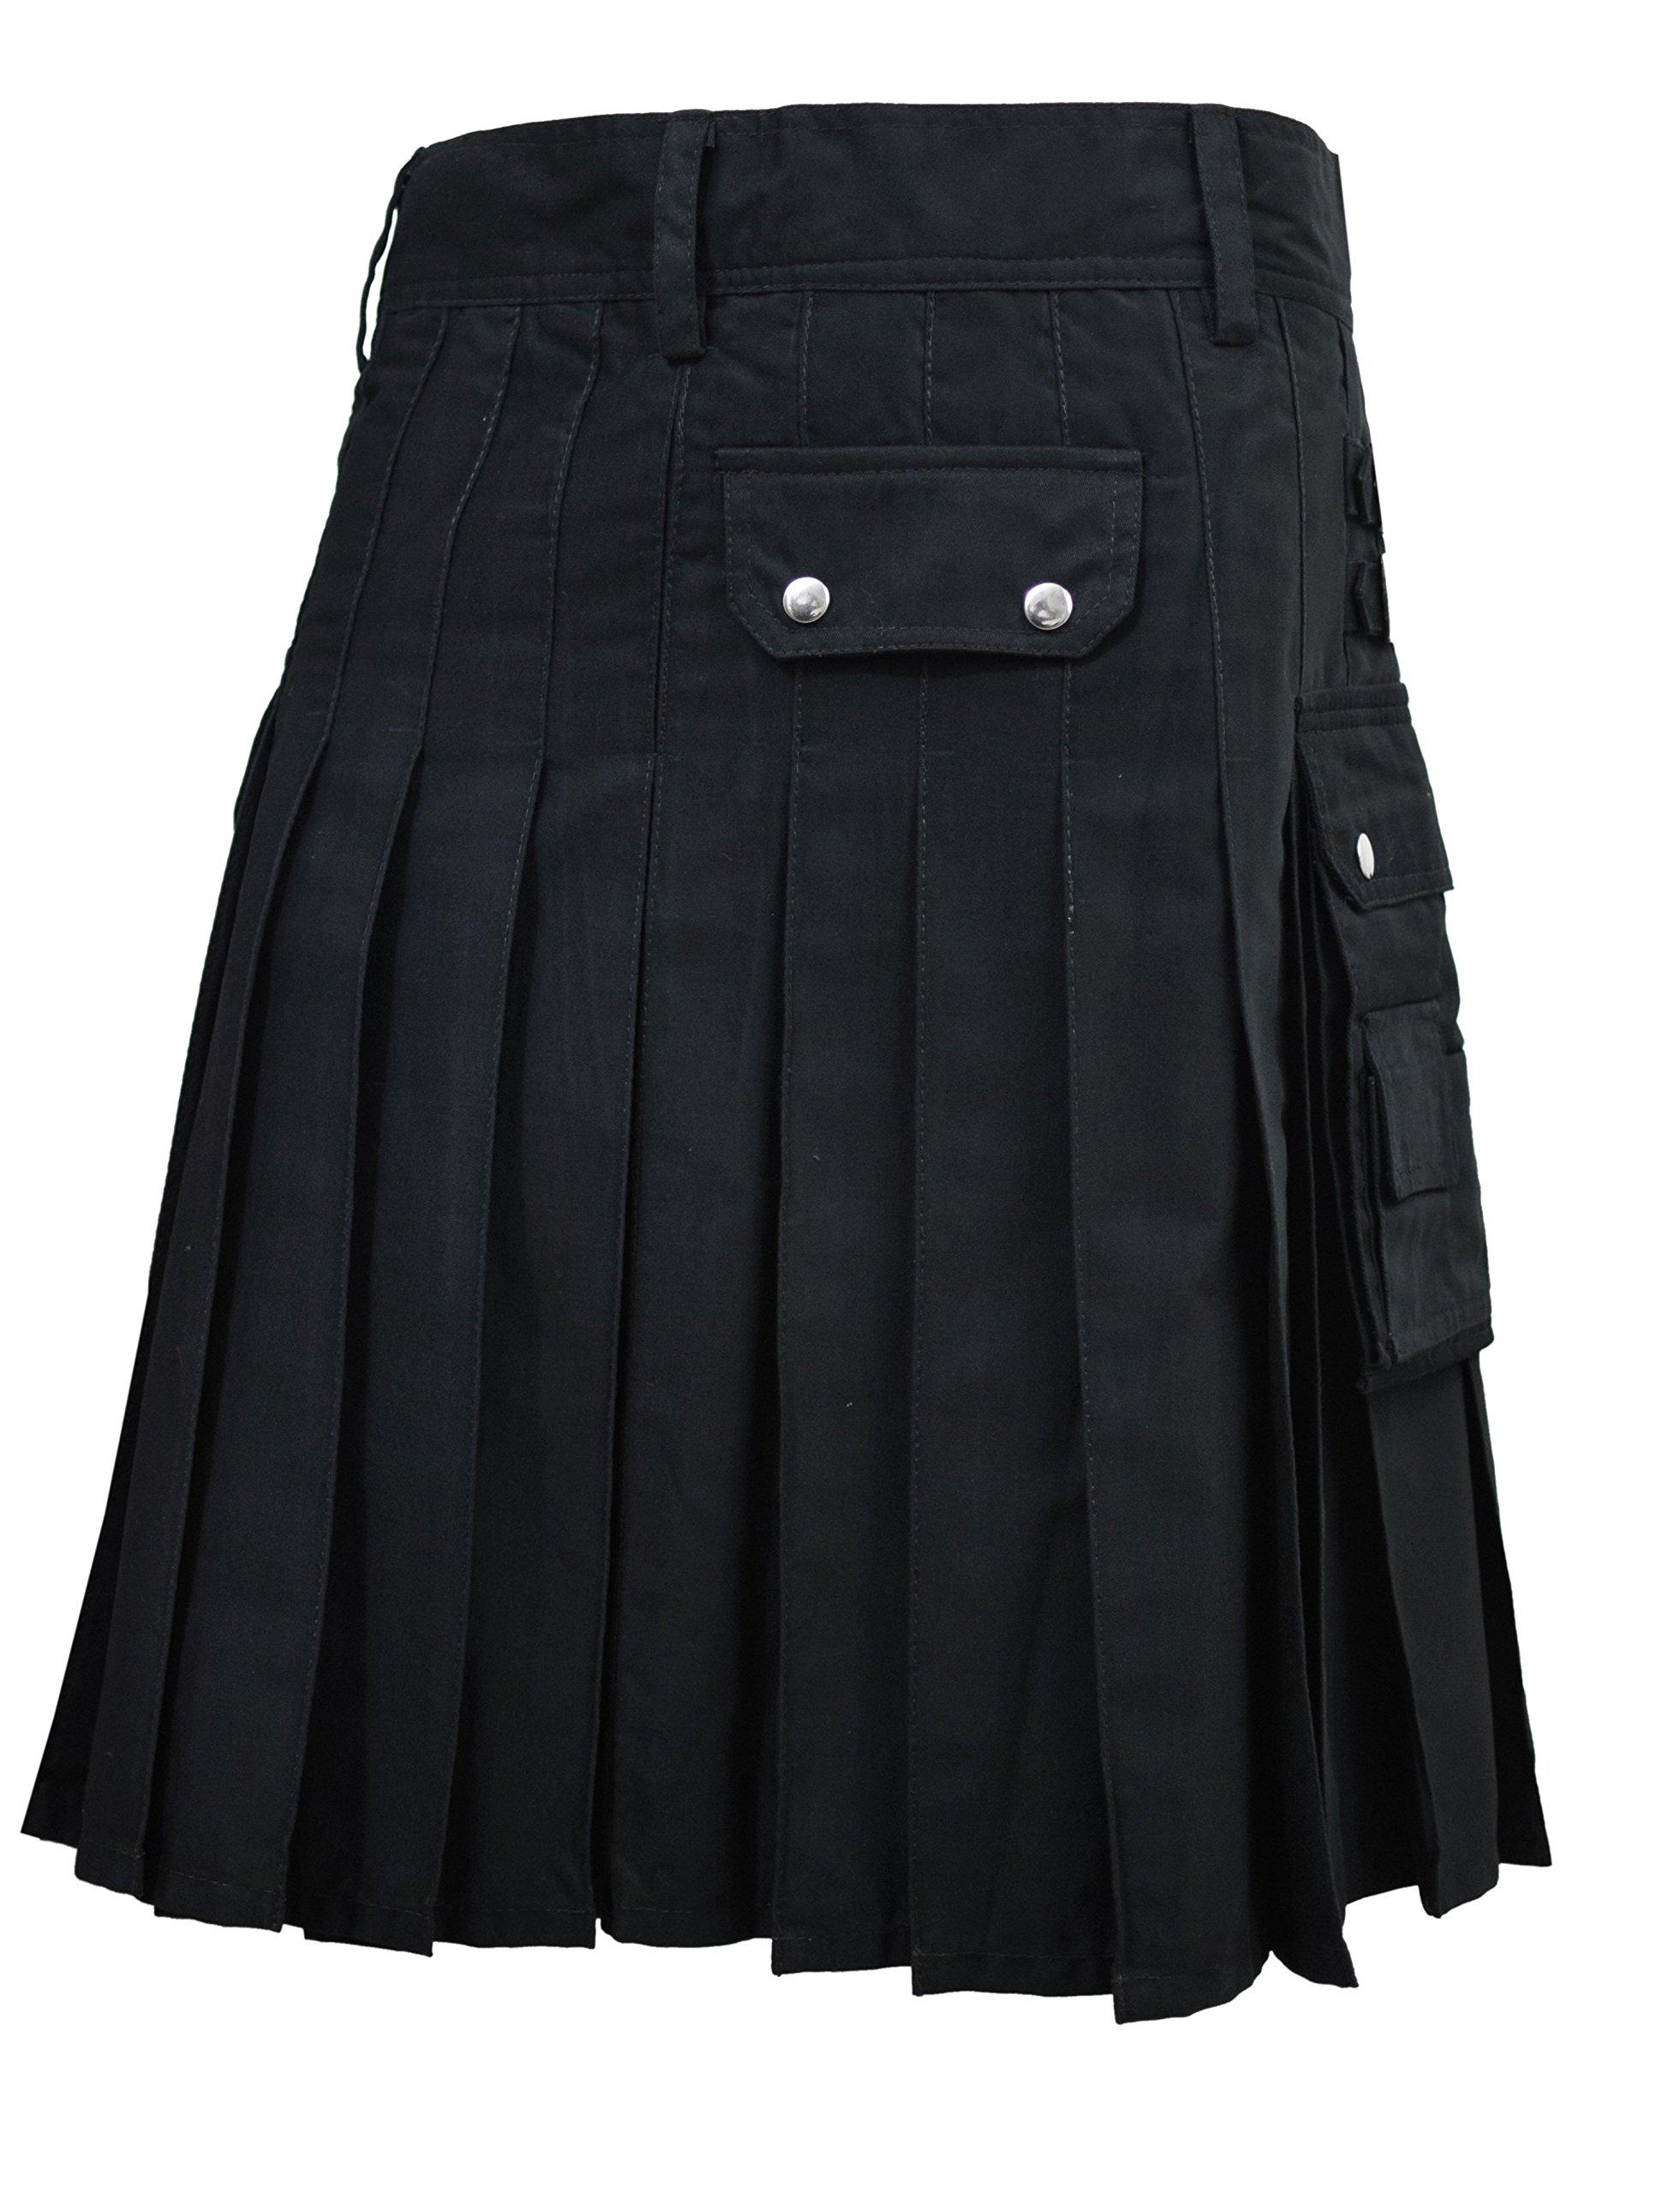 SHYNE Men's Black Fashion Sport Utility Kilt Deluxe Kilt Adjustable Sizes Pocket Kilt (38'')